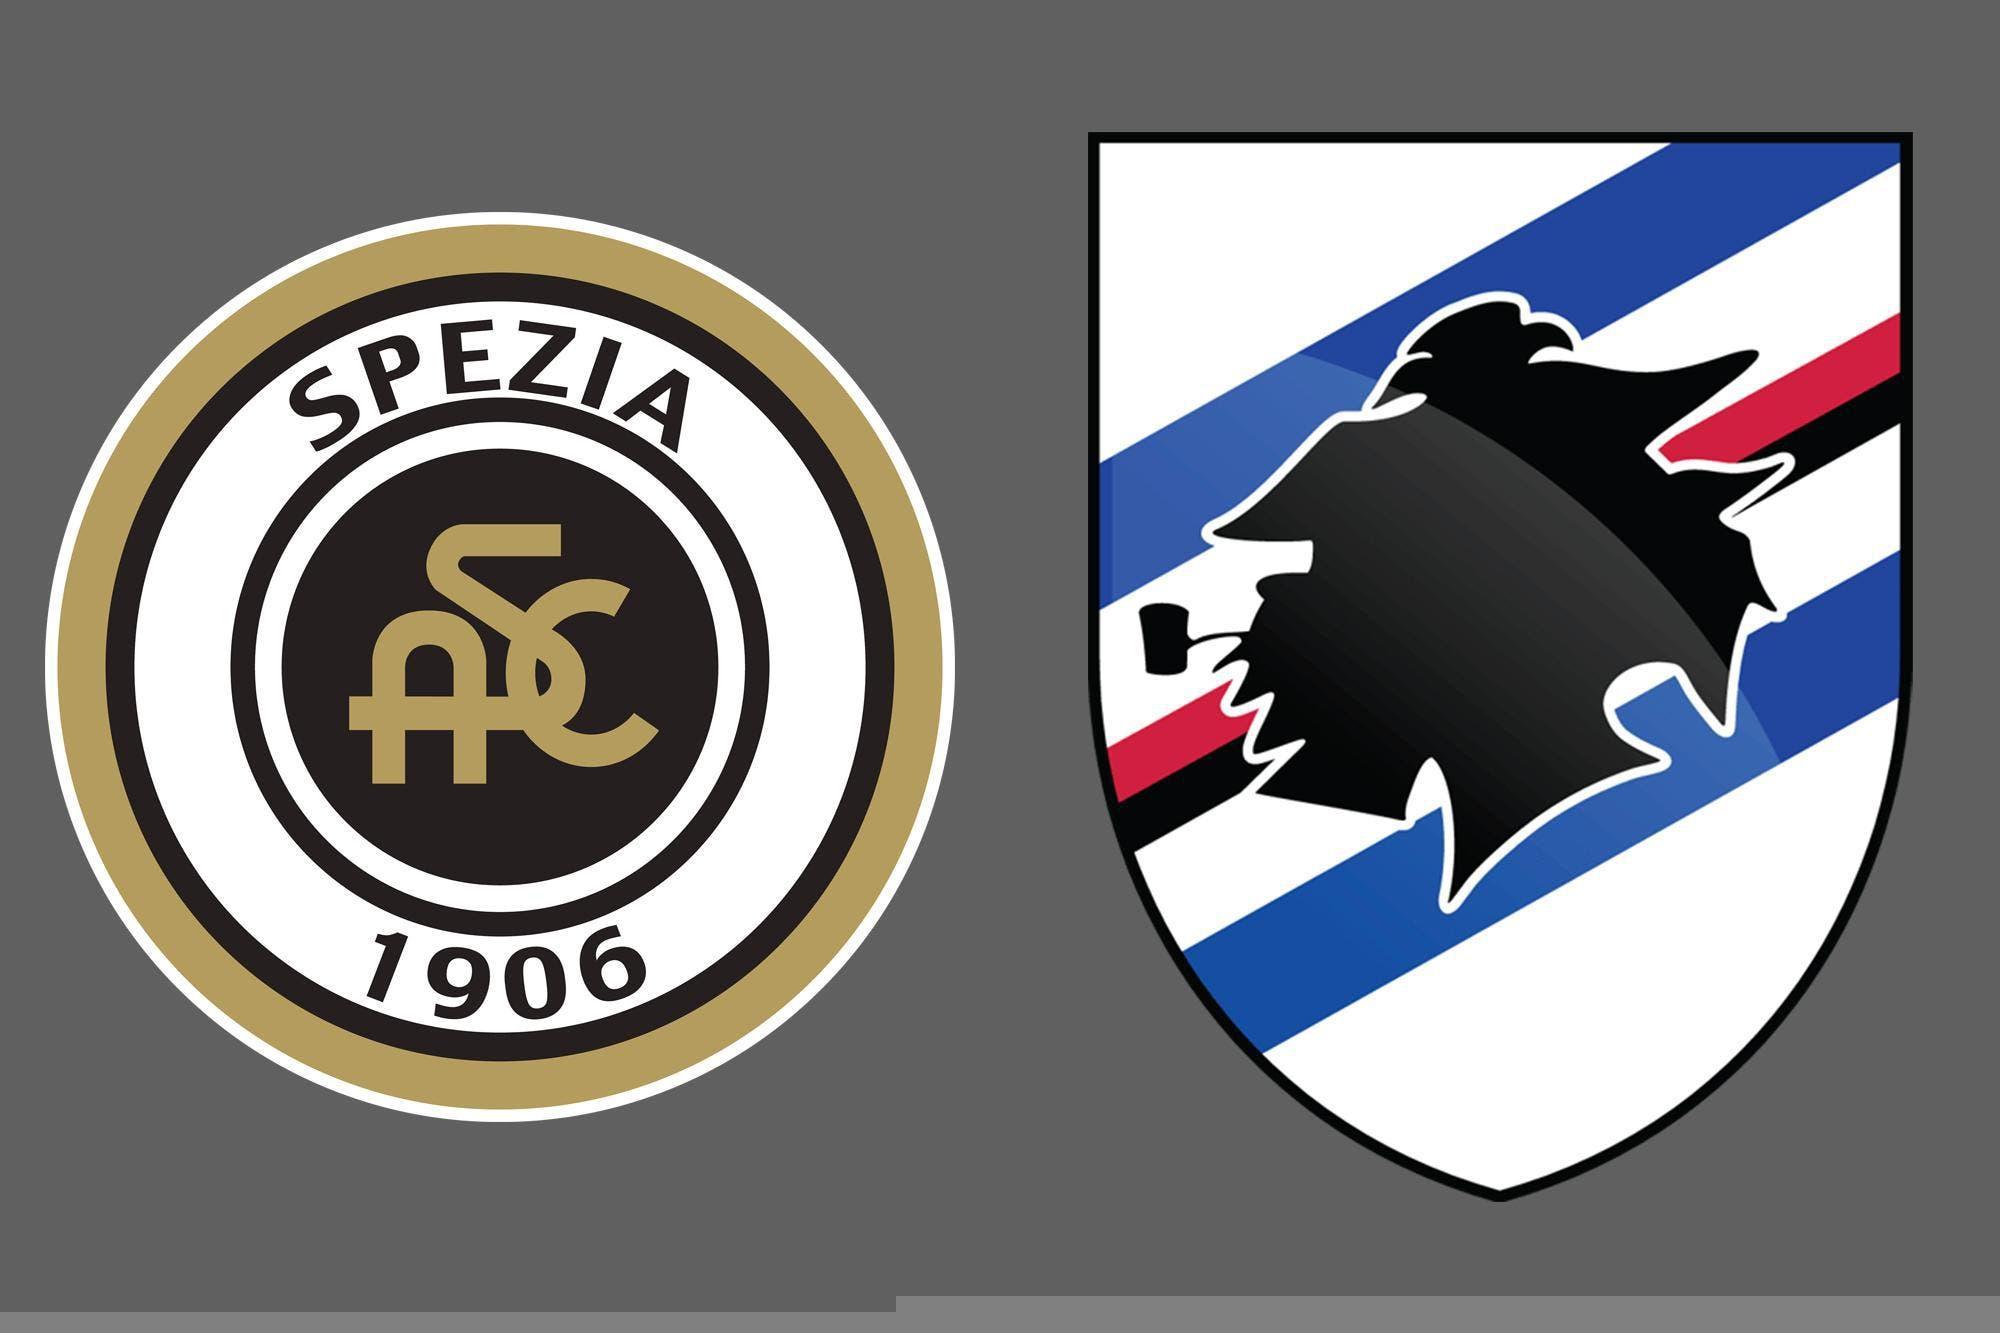 Serie A de Italia: Spezia venció por 2-1 a Sampdoria como local